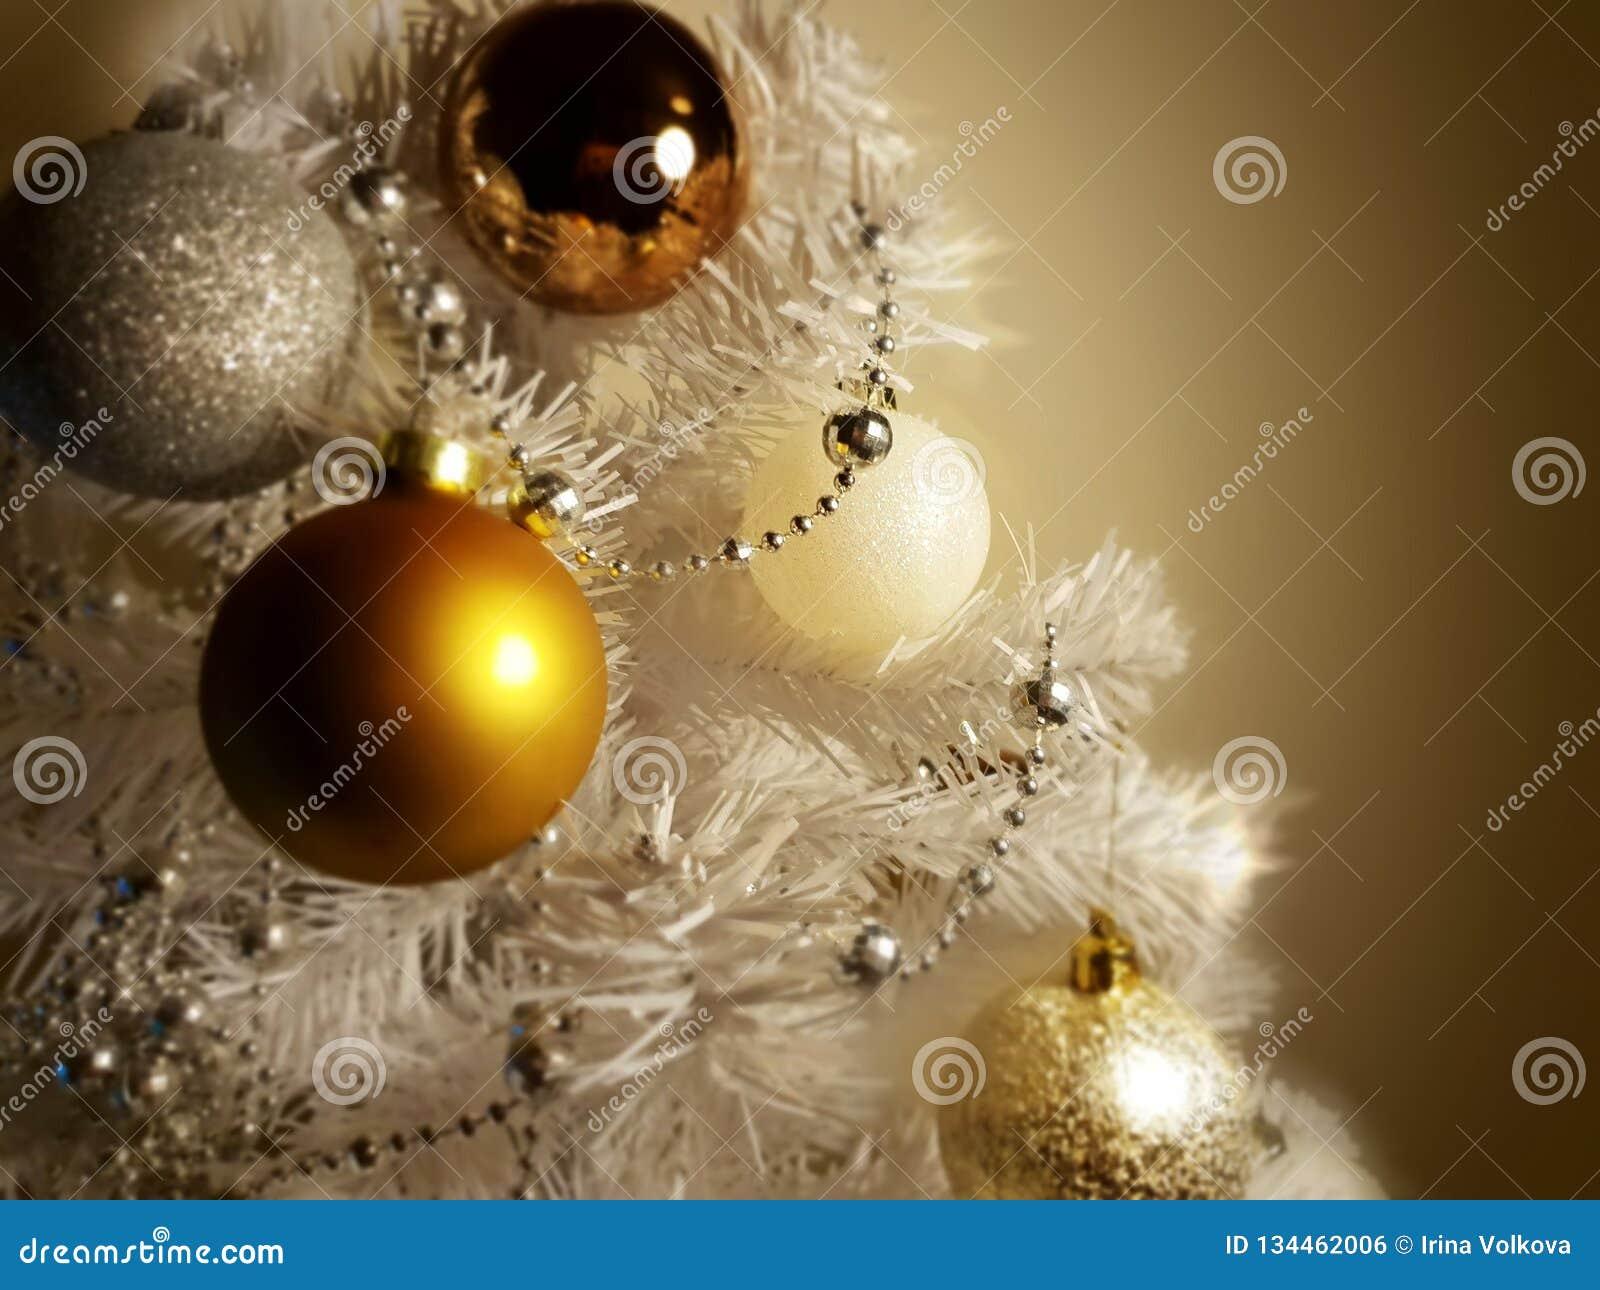 White Christmas decoration tree, gold ,silver, ,white balls silver garland,christmas light,decoration ,illumination ideas